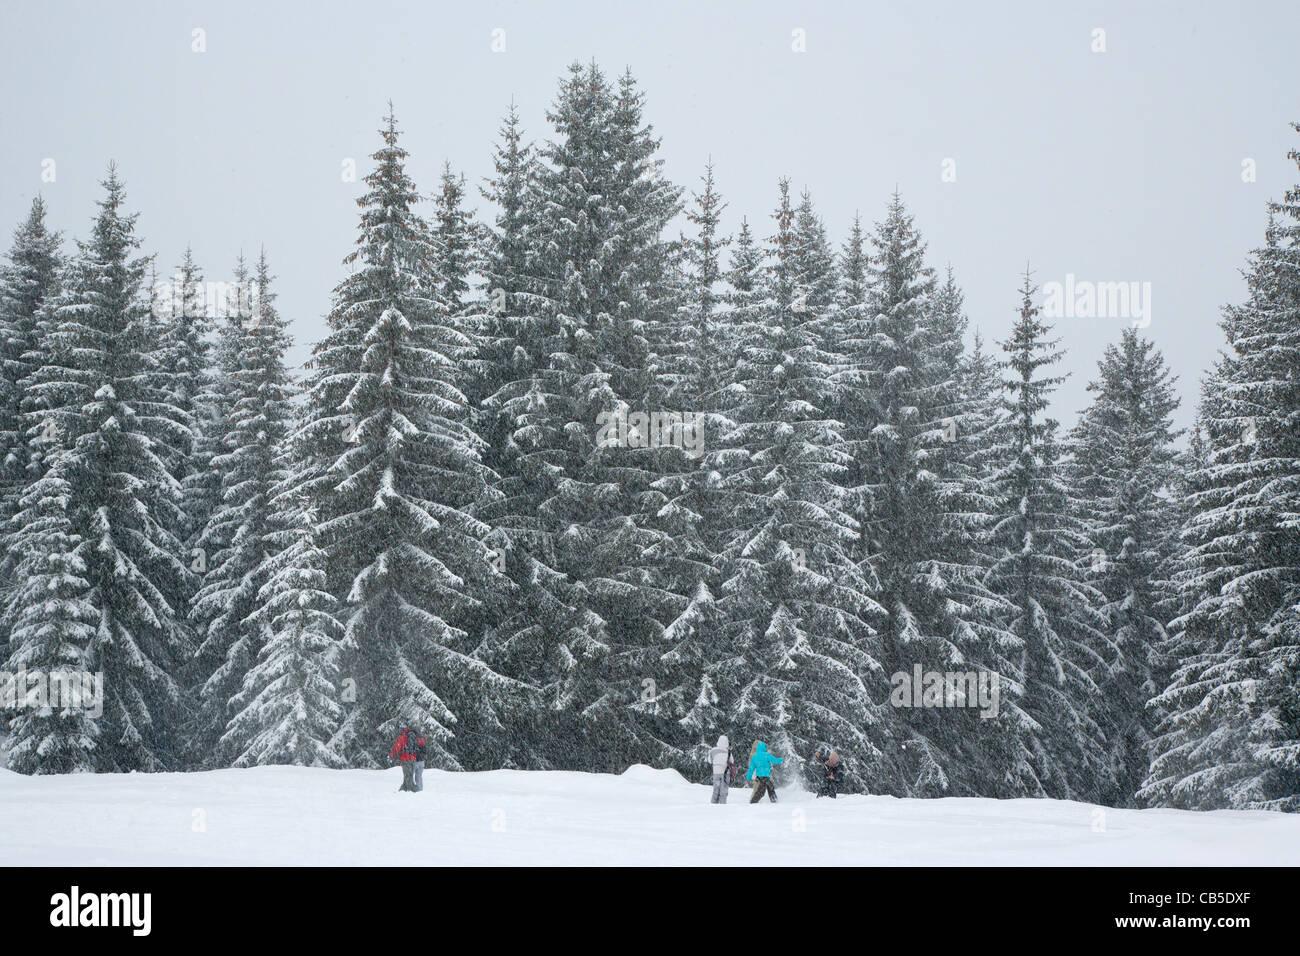 Fir trees and snow, Les Gets, Haute Savoie, Rhône-Alpes, France - Stock Image